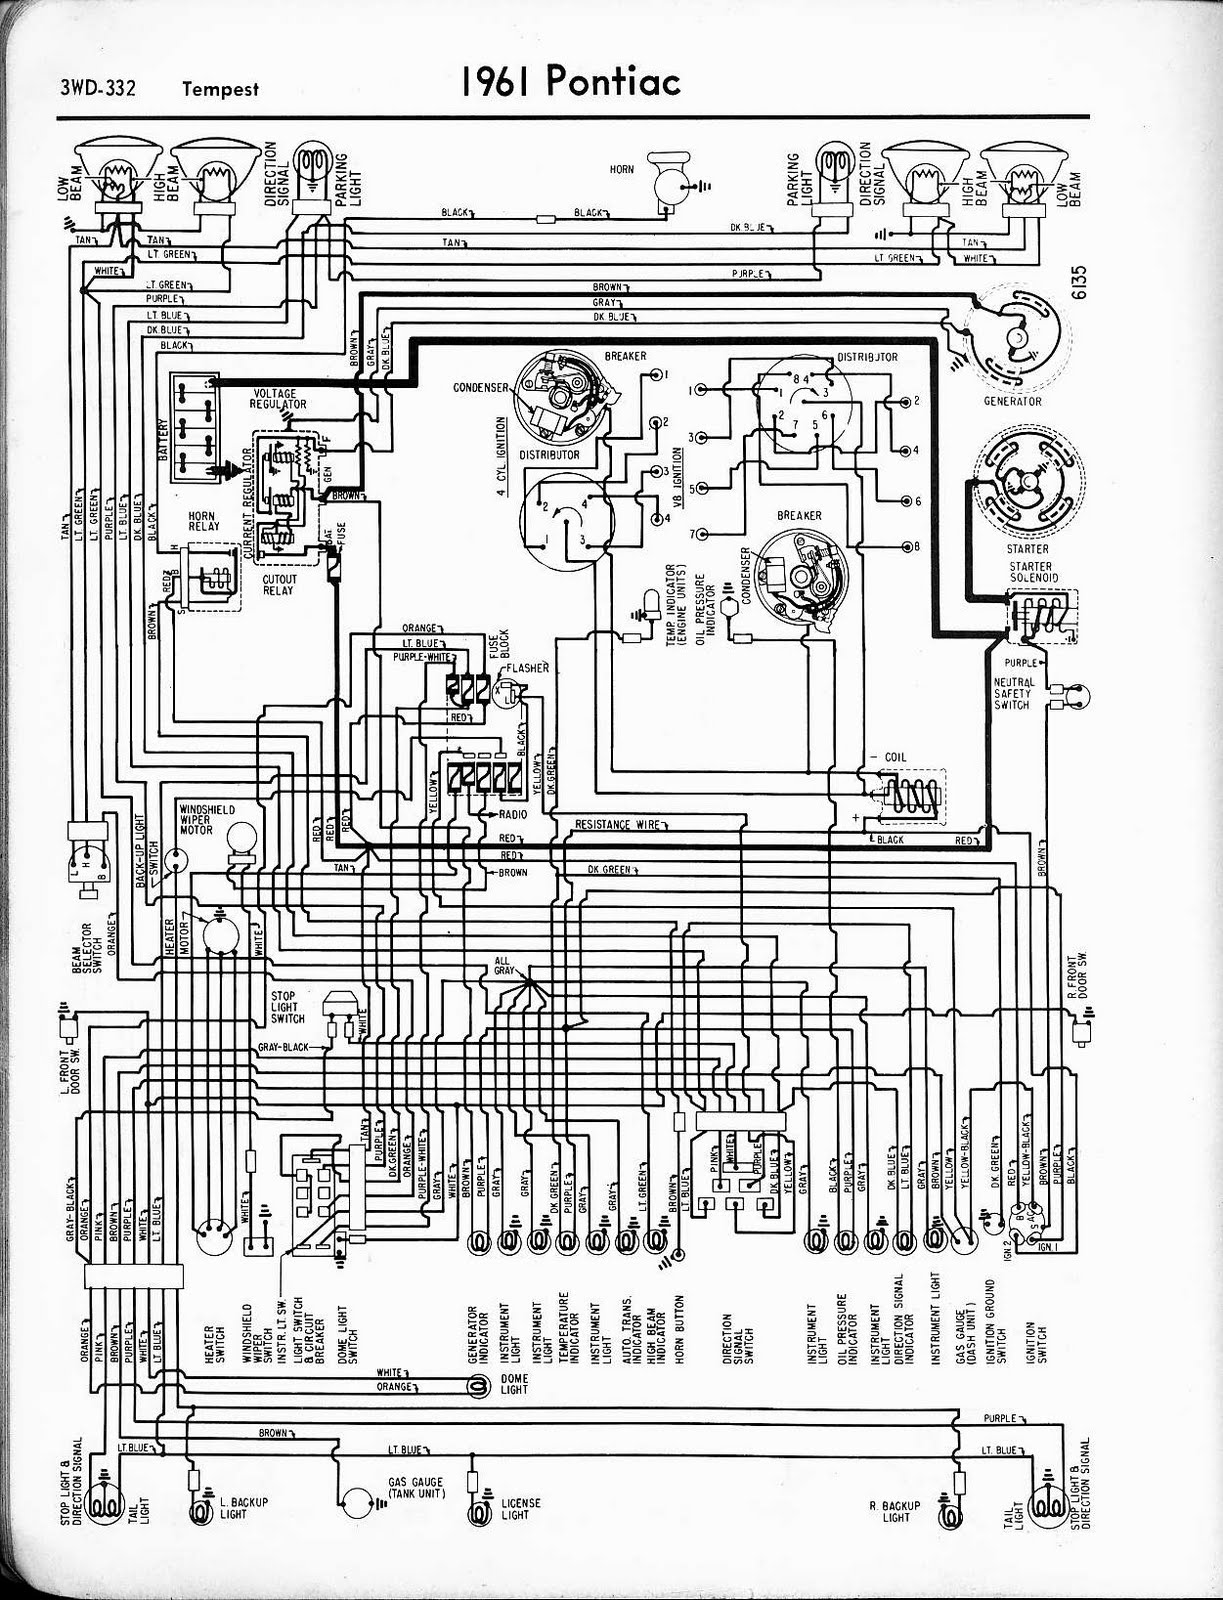 medium resolution of free auto wiring diagram 1961 pontiac tempest wiring diagram 2003 silverado fog light wiring harness 2009